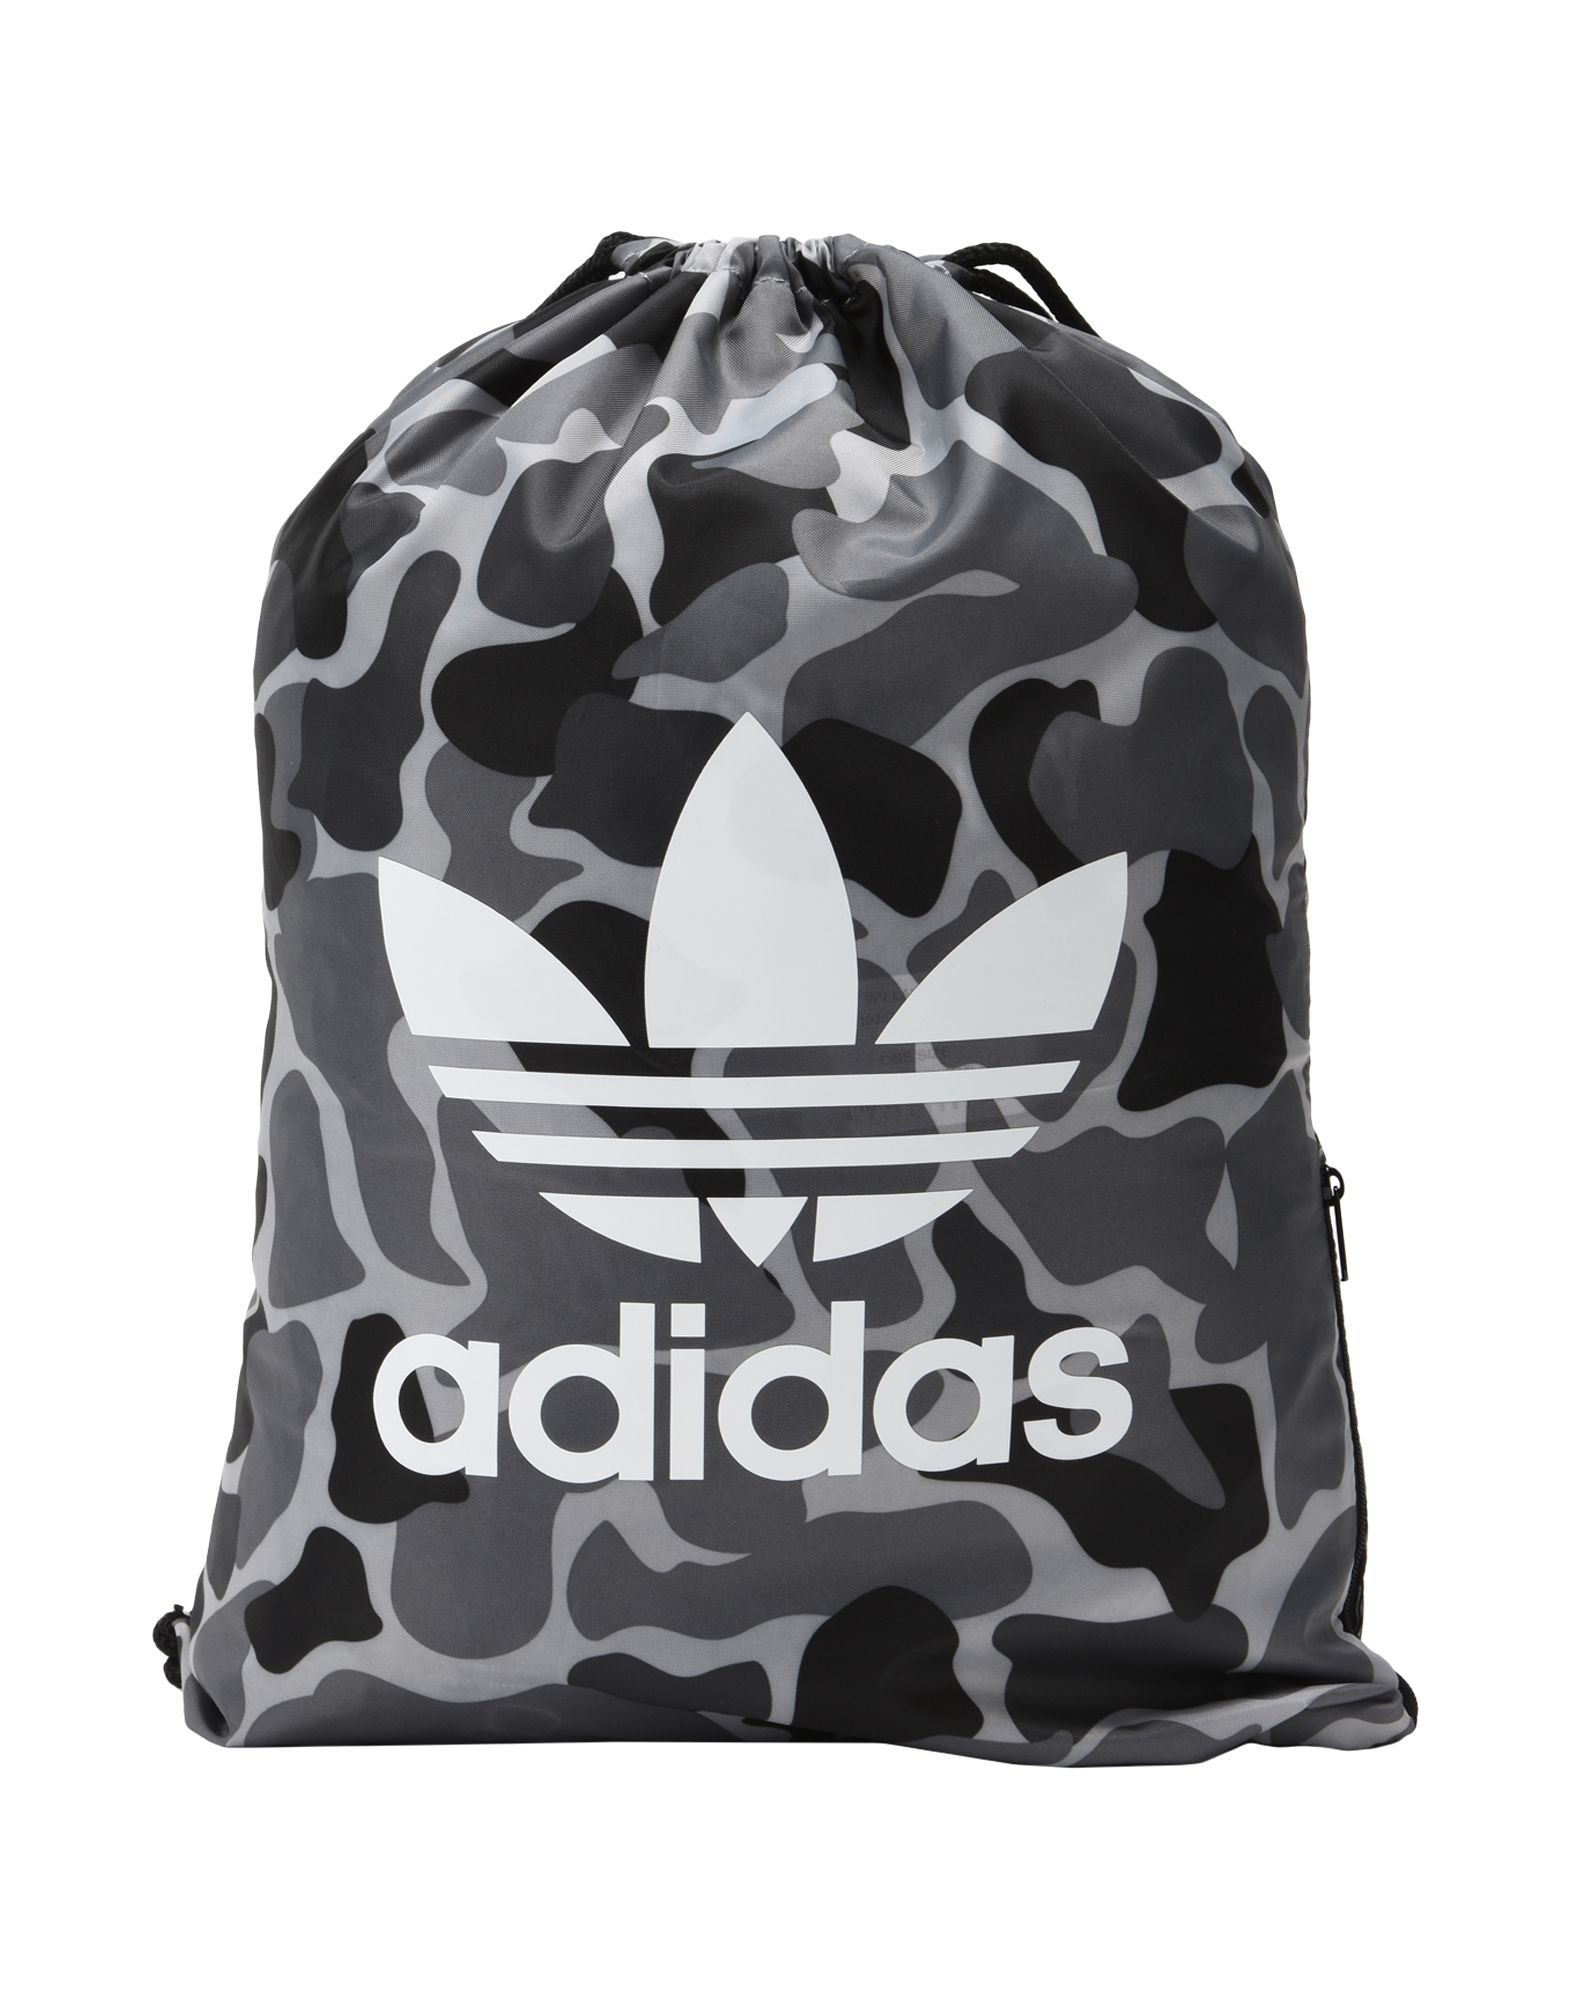 ADIDAS ORIGINALS Рюкзаки и сумки на пояс женские сумки